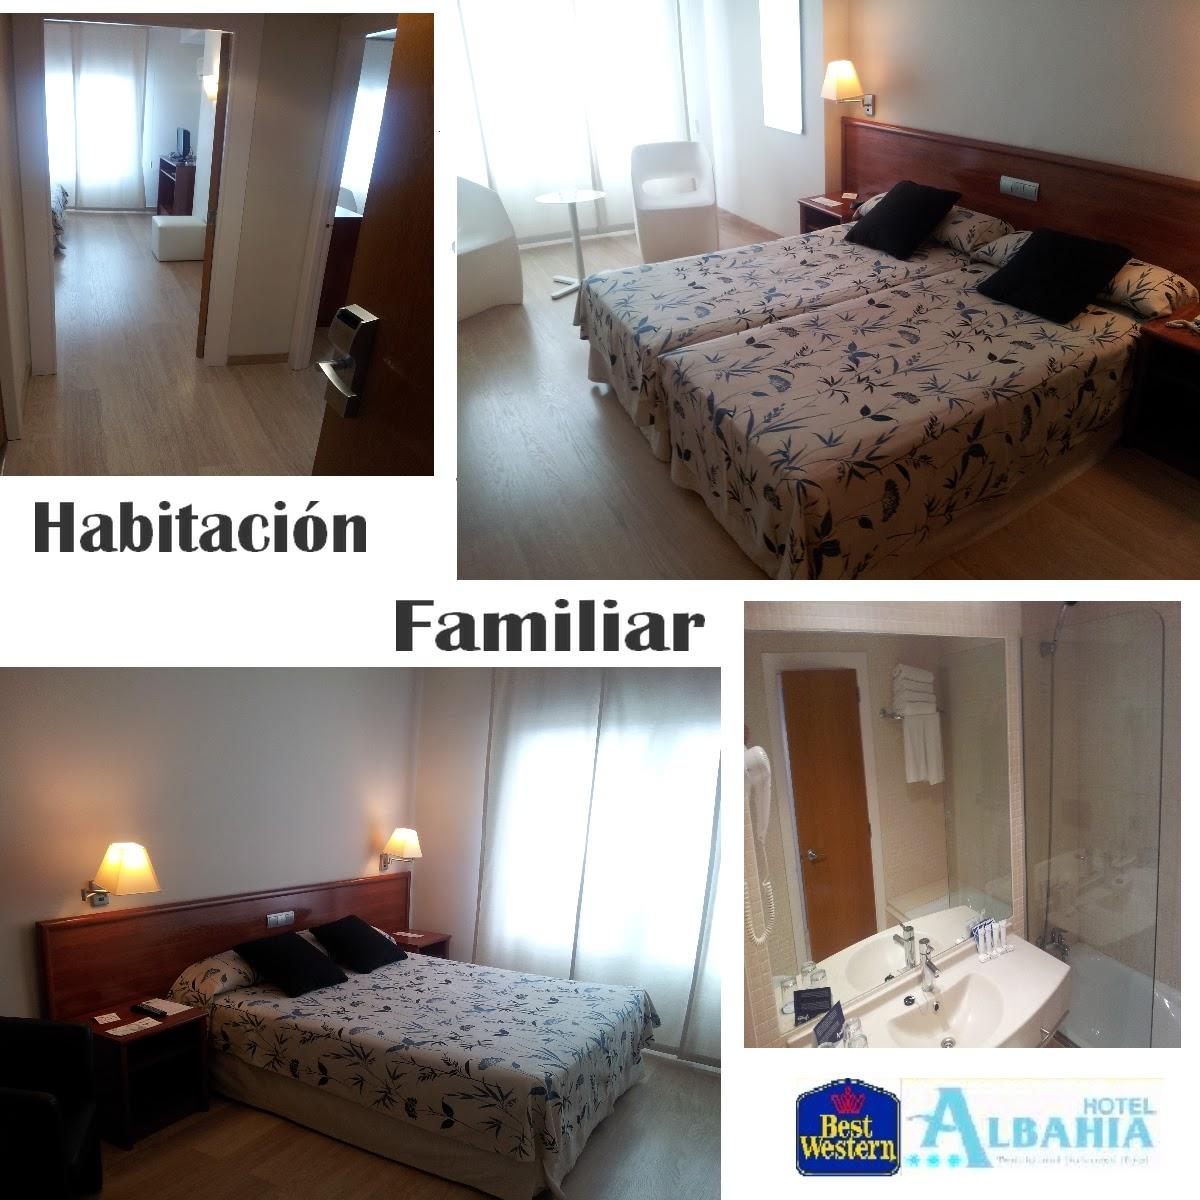 Best western hotel albahia alicante habitaci n familiar for Habitacion hotel familiar palermo